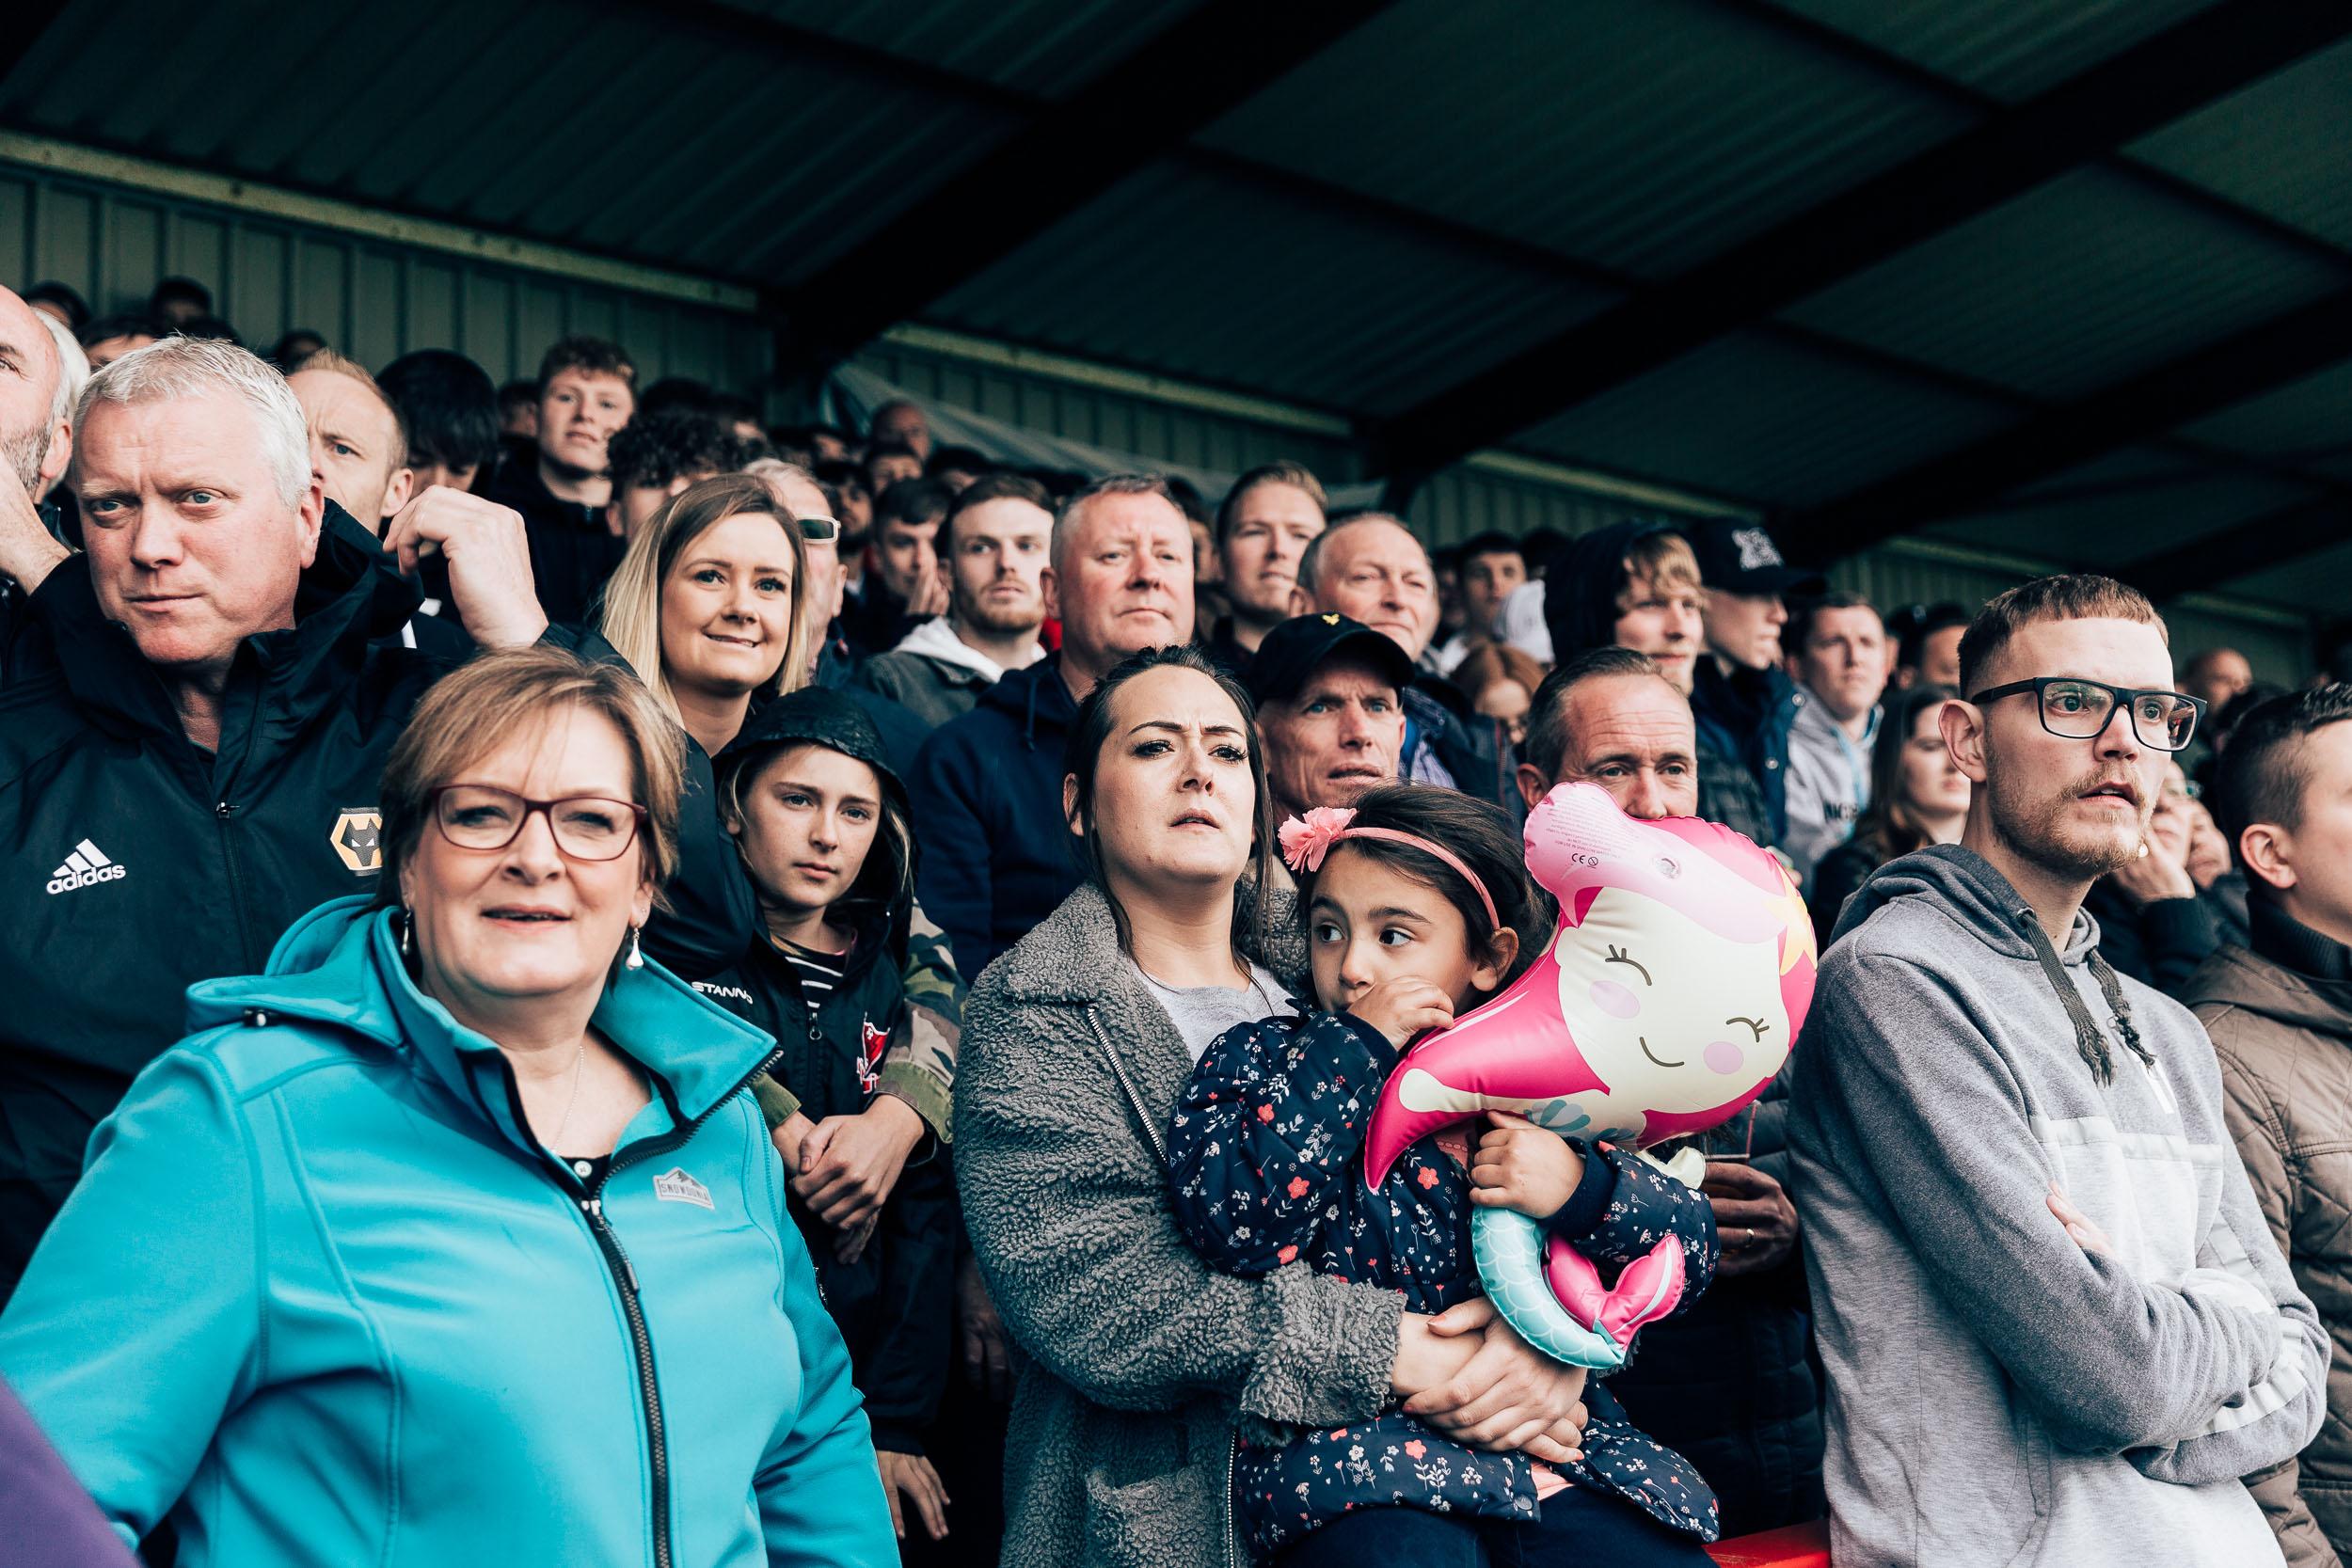 06_05_2019_Bromsgrove_Sporting_Corby-100.jpg